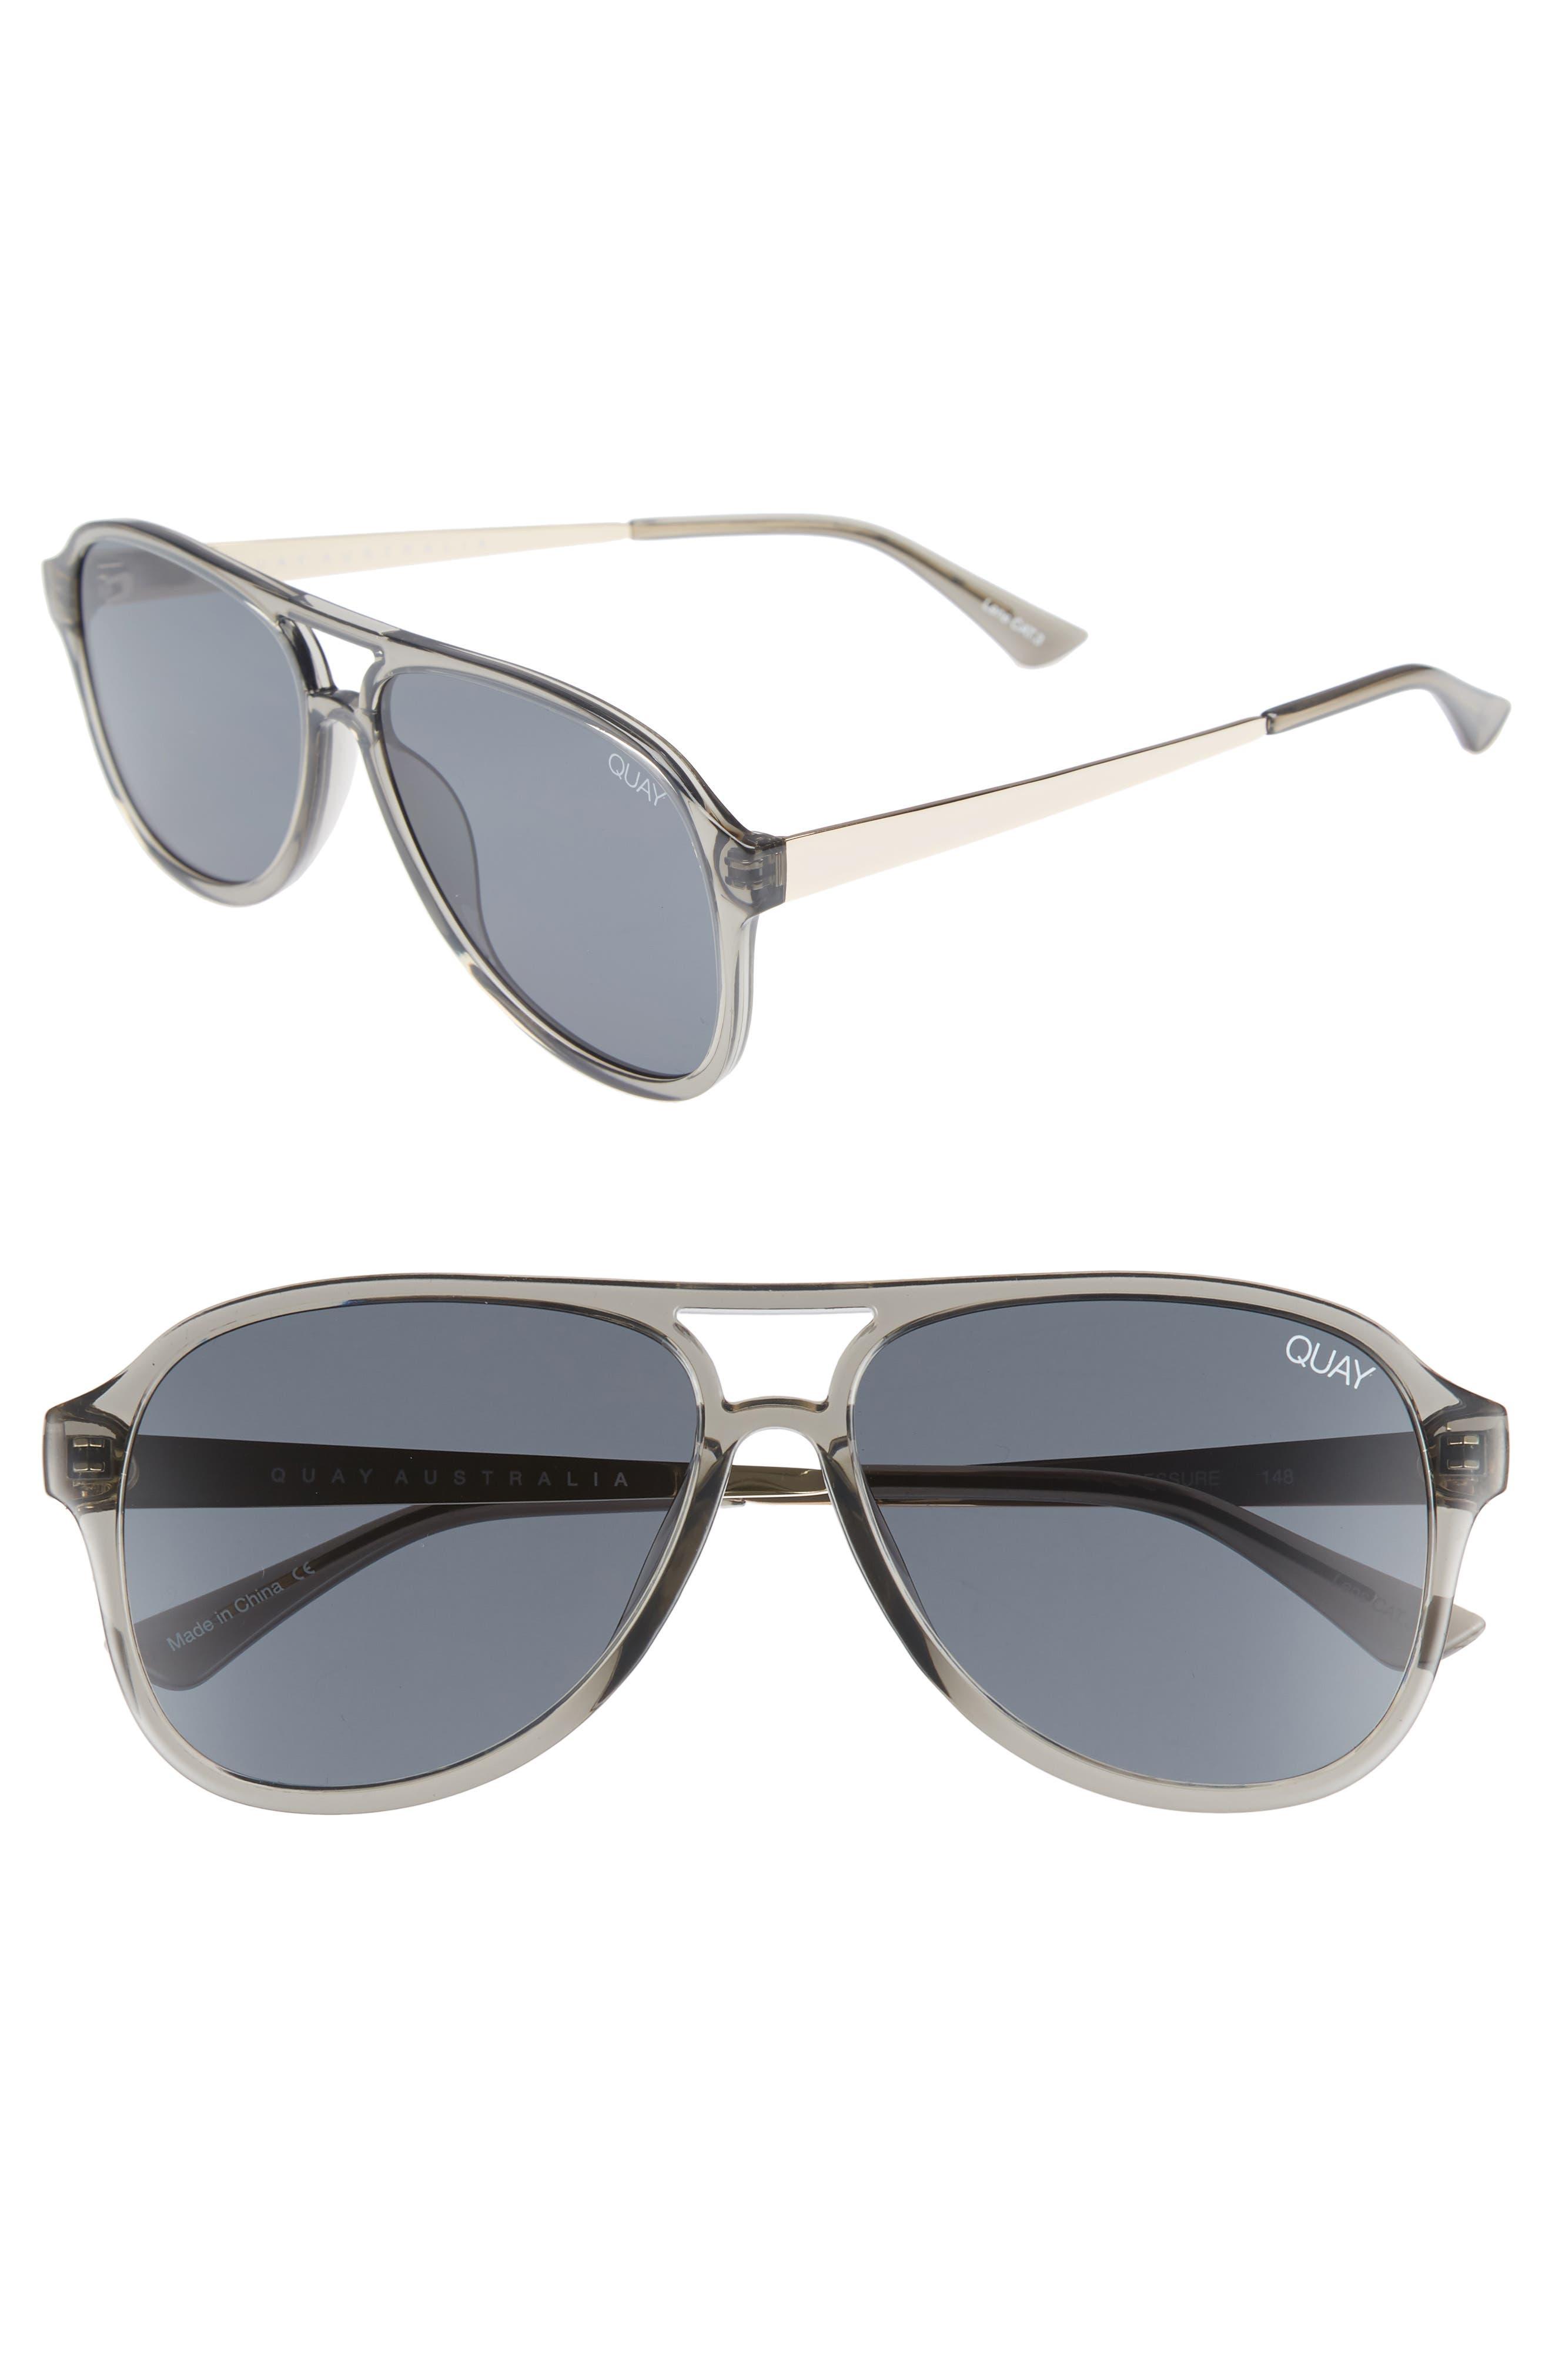 Under Pressure 58mm Aviator Sunglasses,                         Main,                         color, GREY/ SMOKE